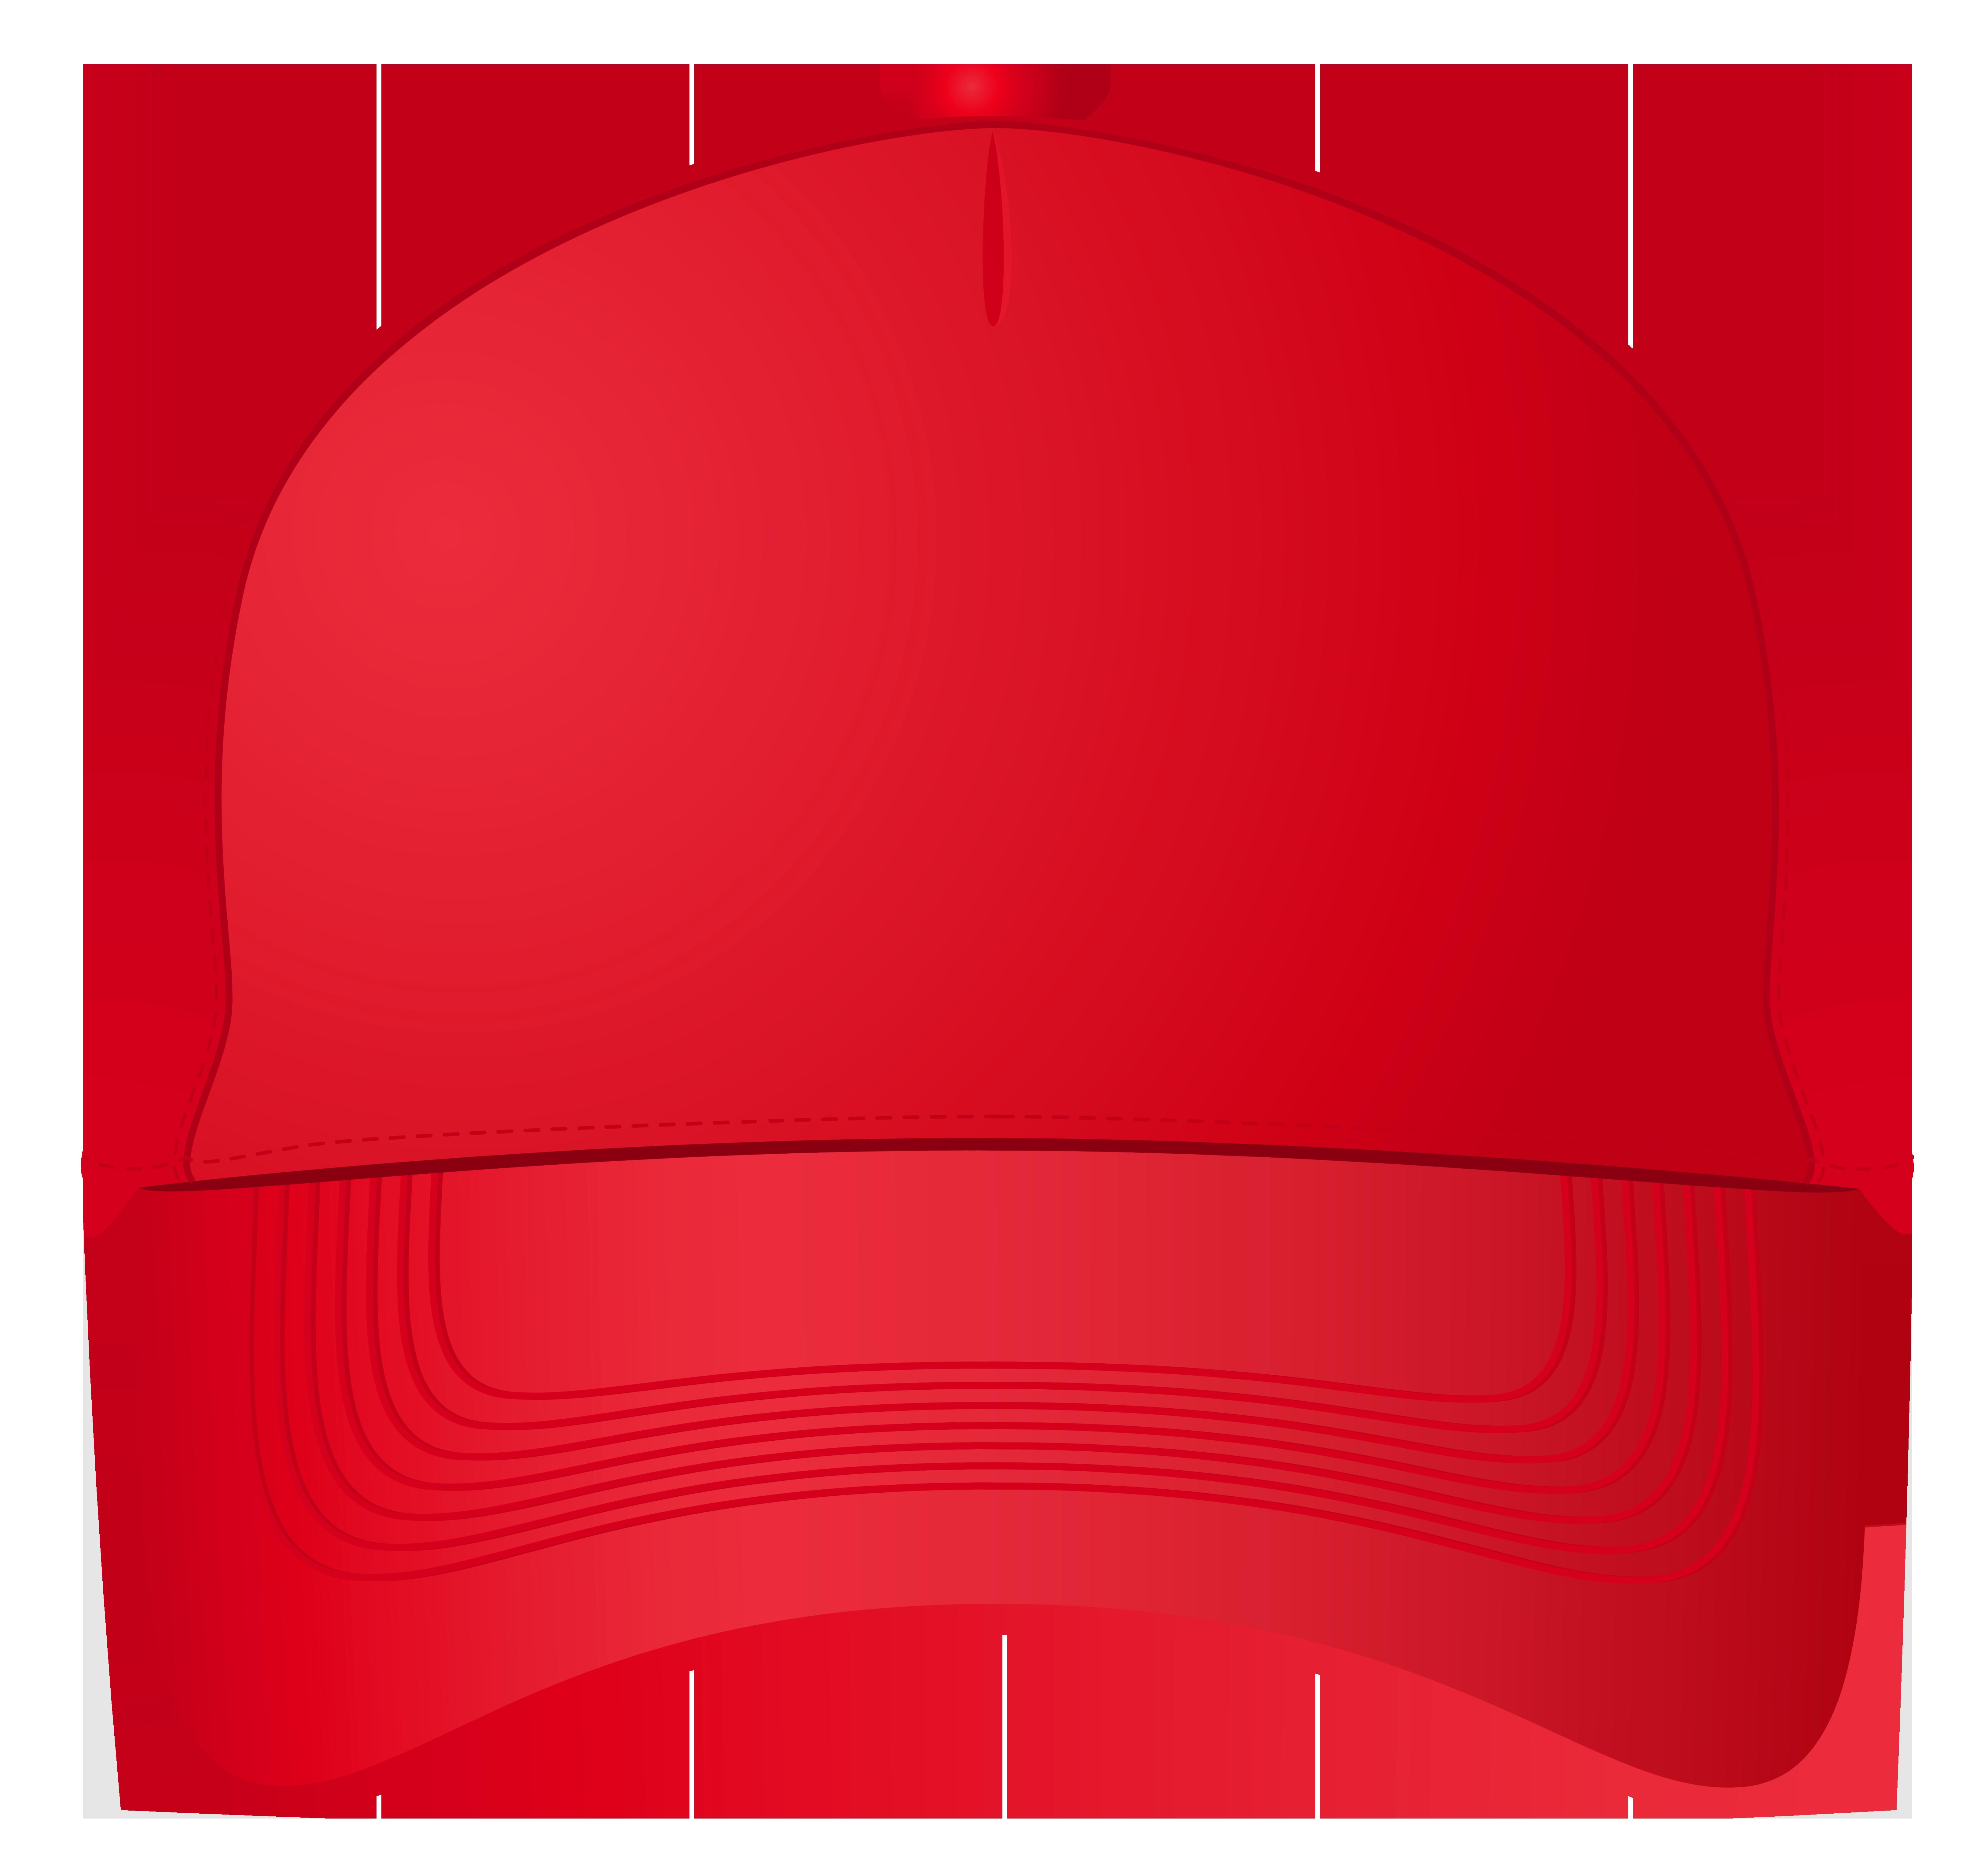 Red Baseball Cap PNG Clipart.